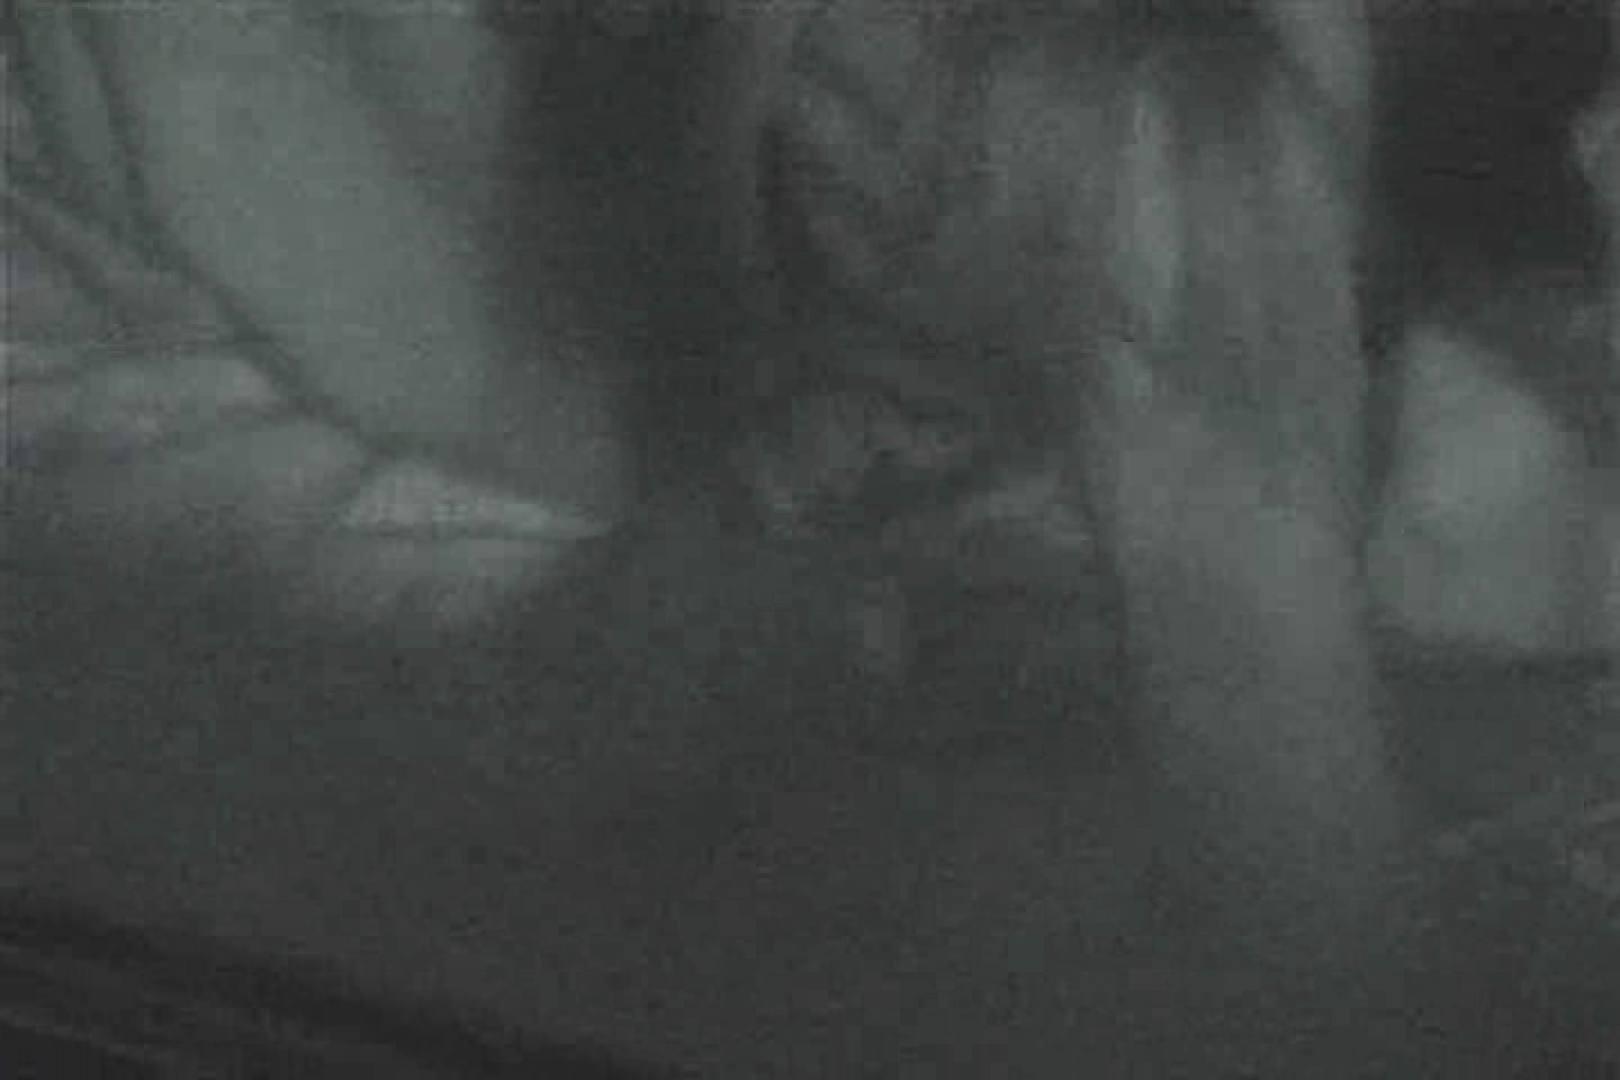 MASAさんの待ち伏せ撮り! 赤外線カーセックスVol.19 赤外線 オメコ無修正動画無料 101pic 69